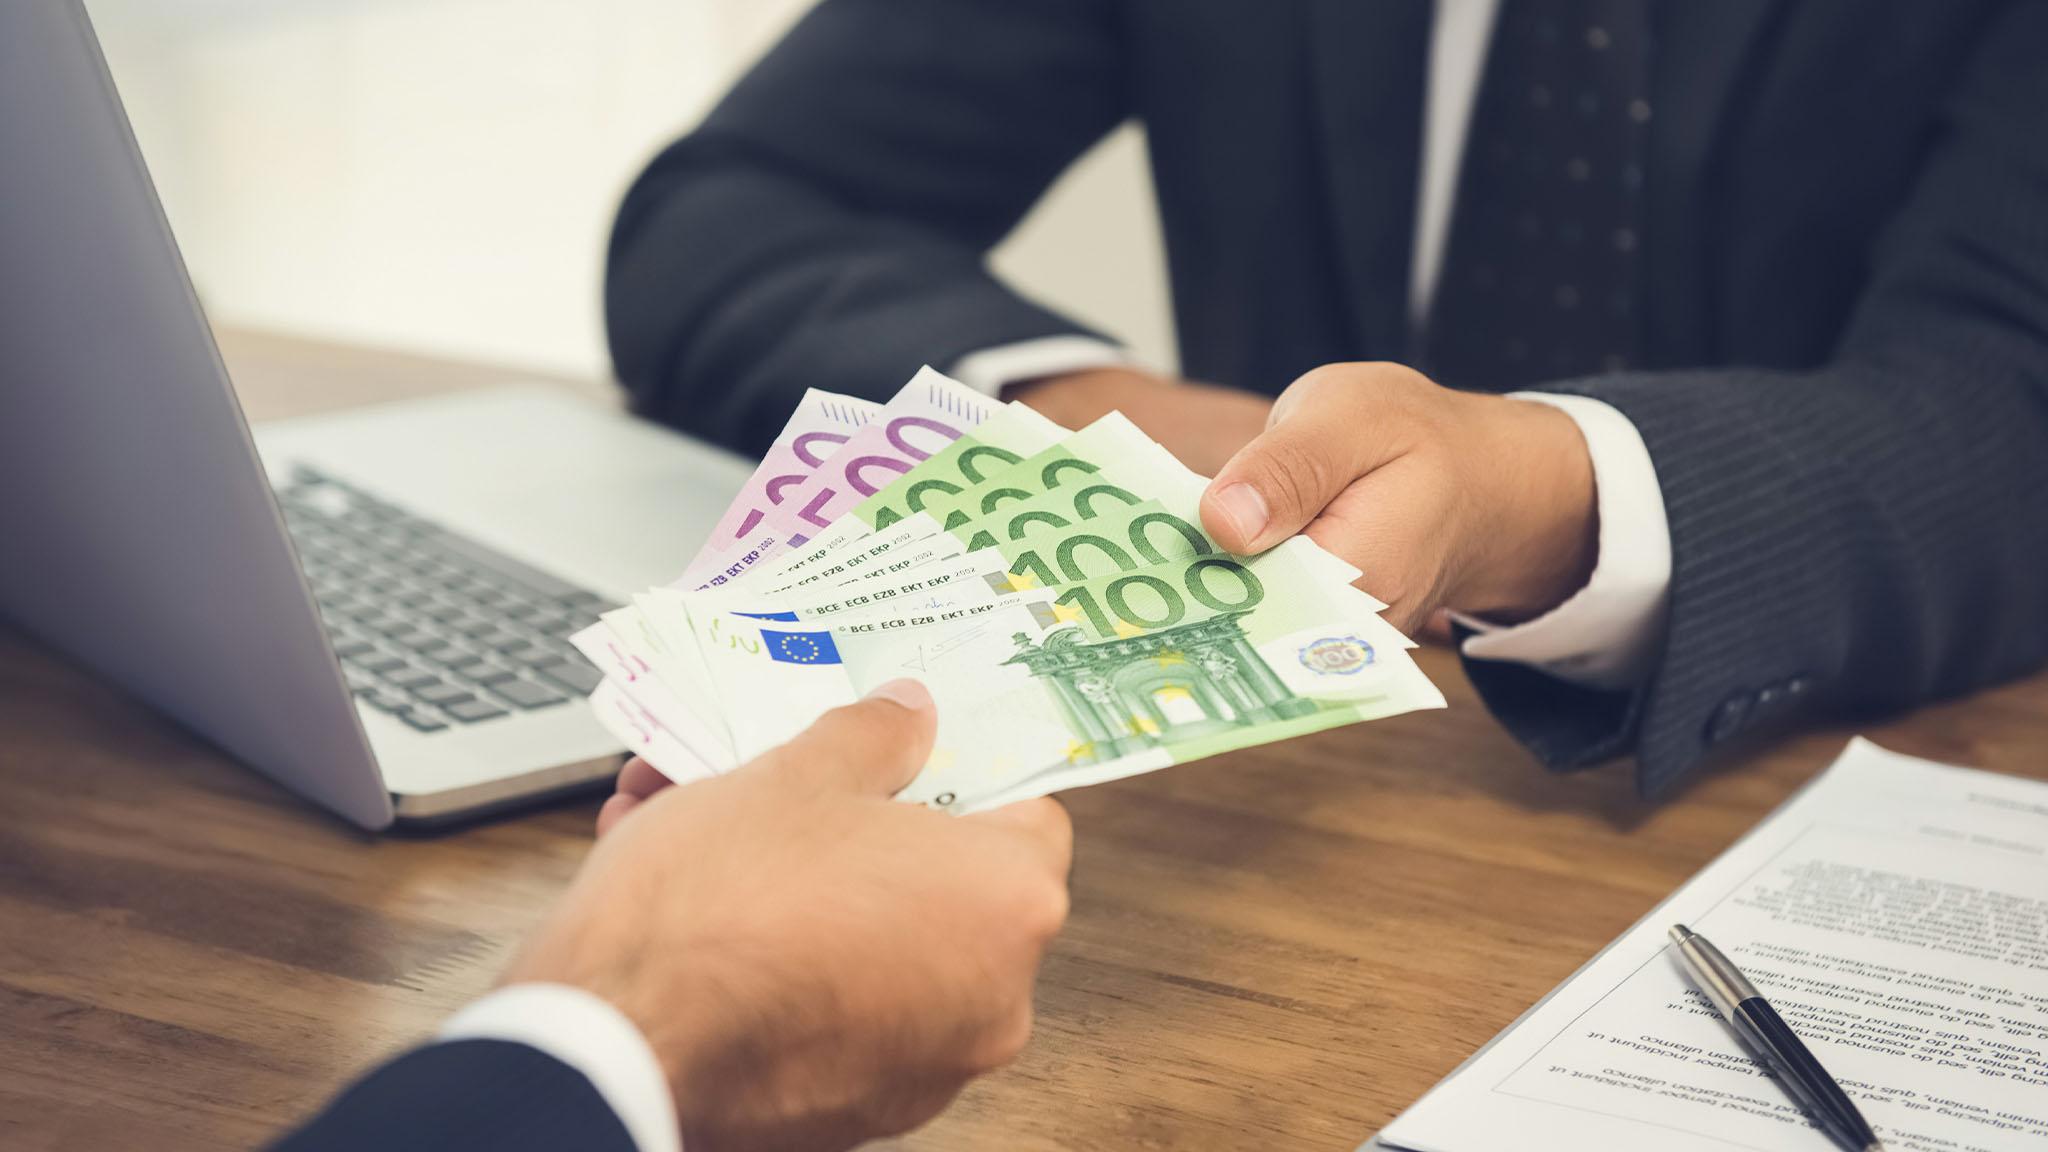 9-Tipps-Sofort-Geld-bekommen-ohne-Kredit